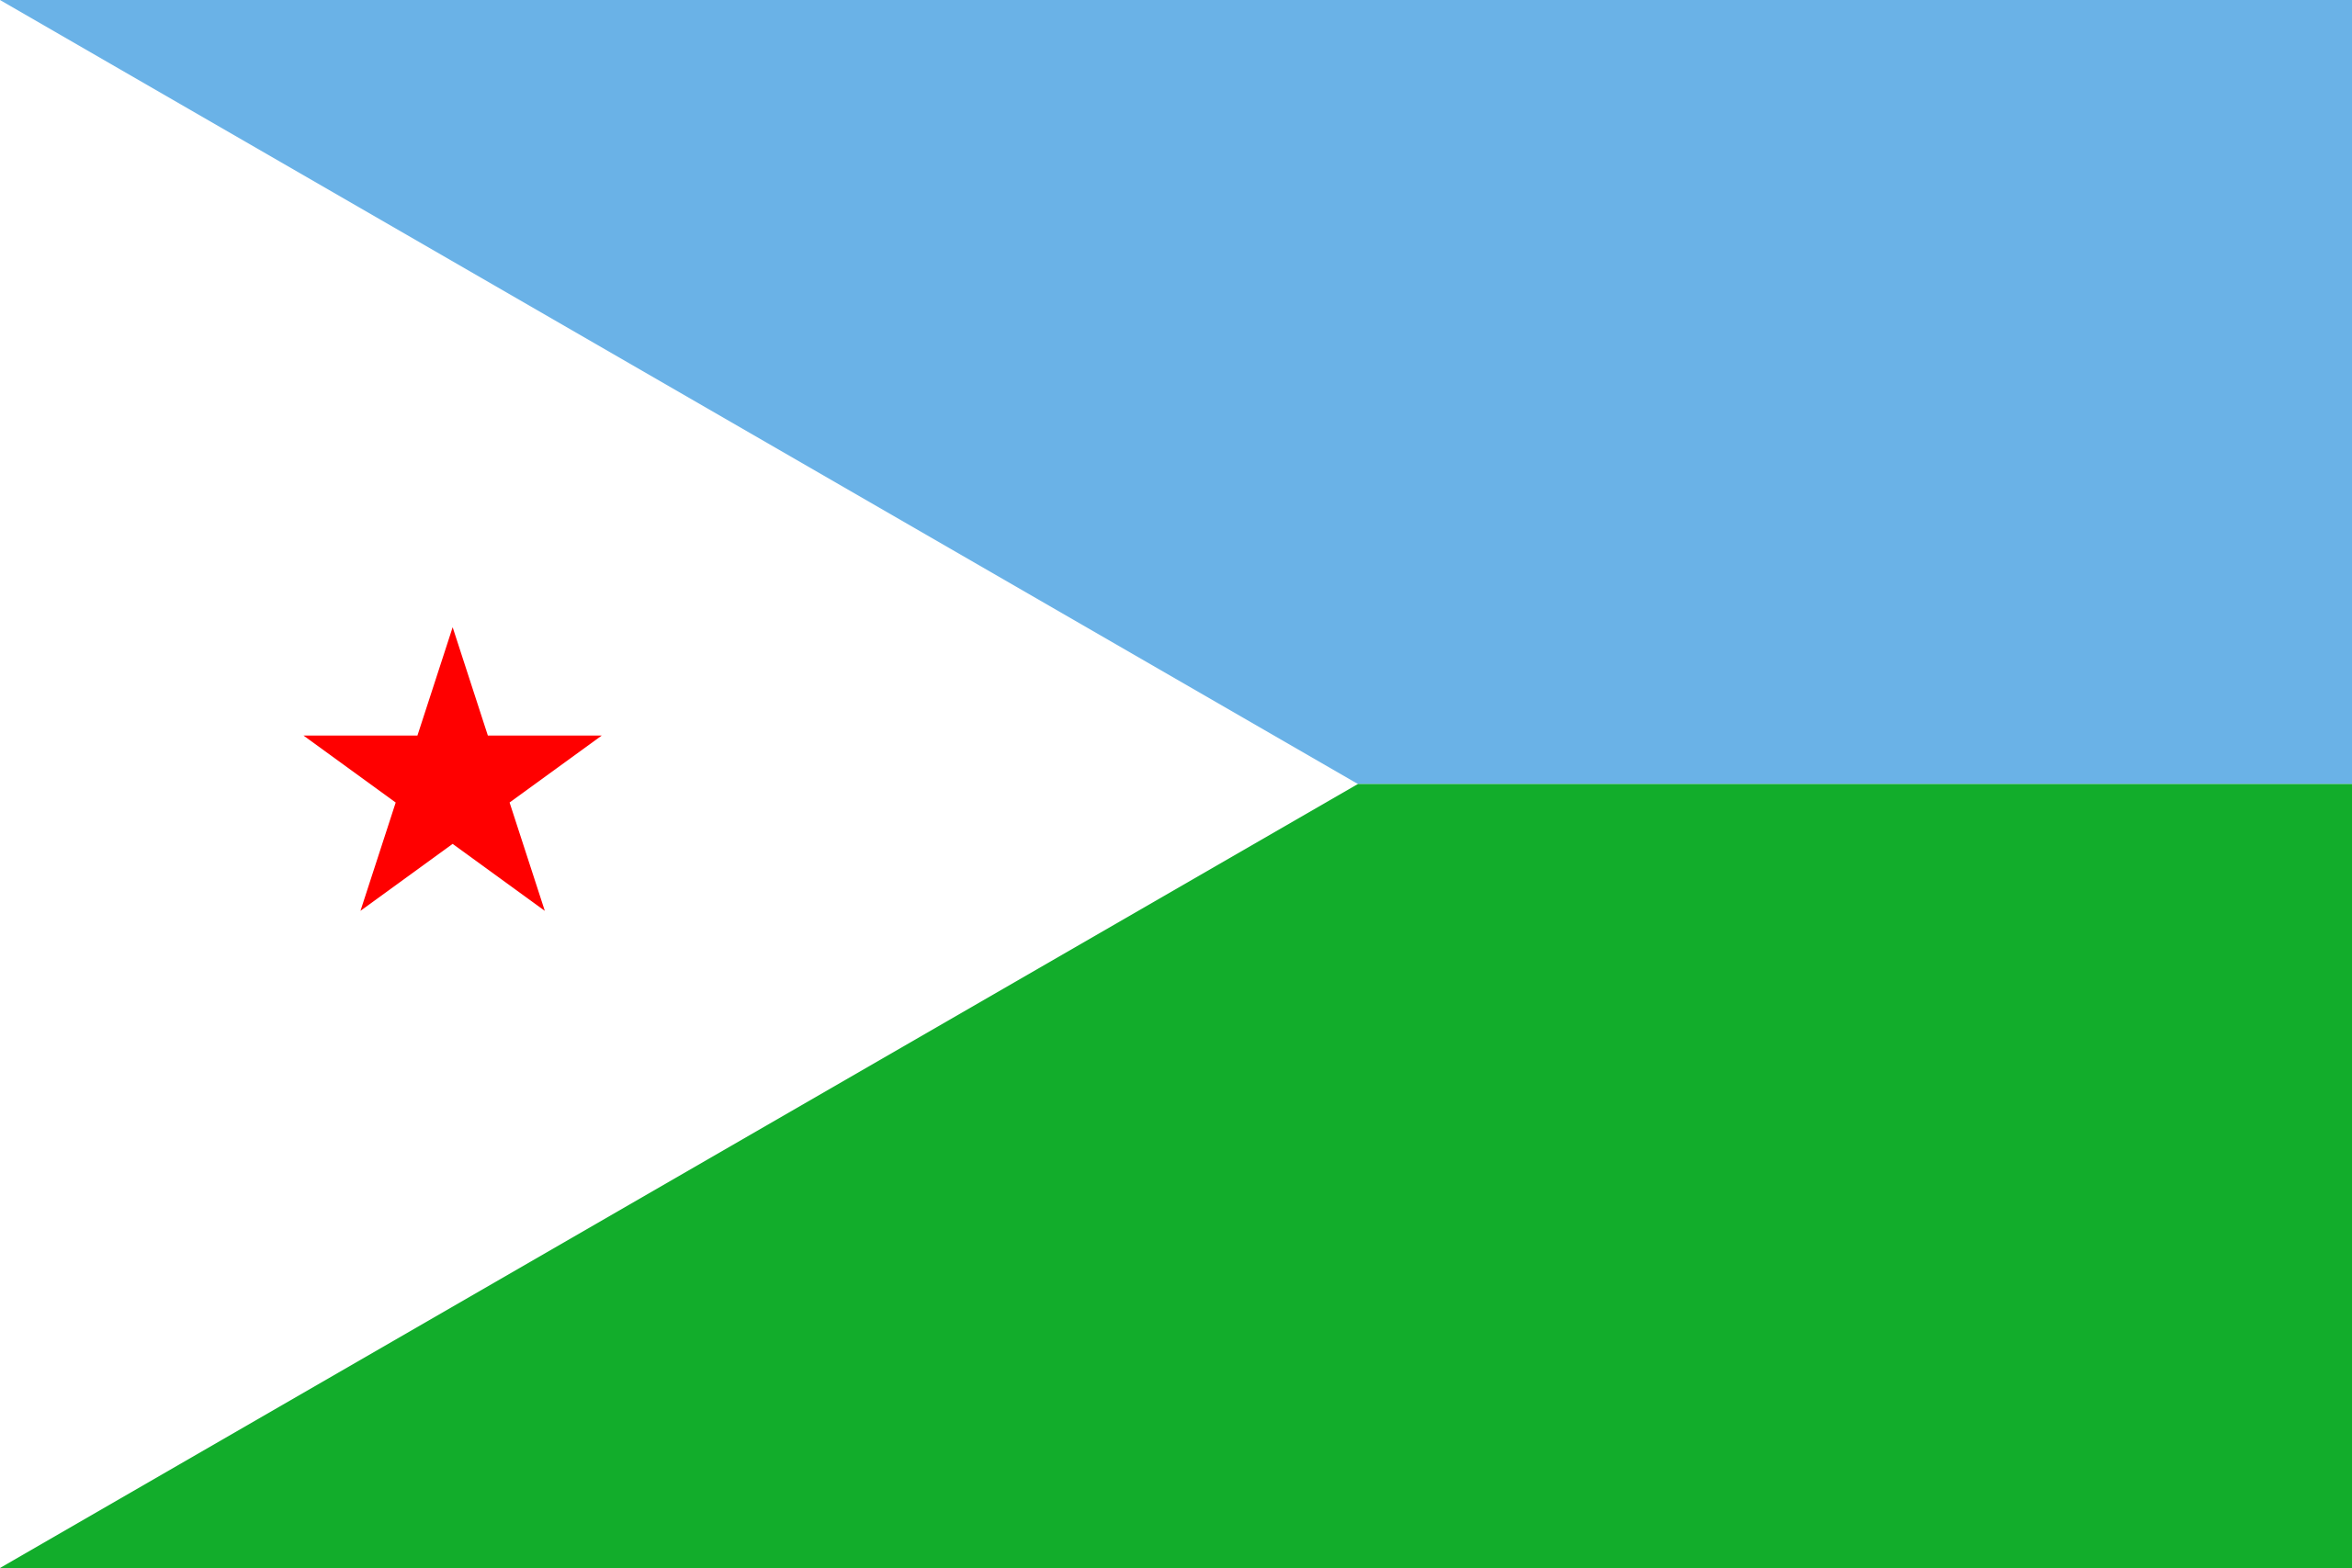 yibuti, país, emblema, insignia, символ - Обои HD - Профессор falken.com